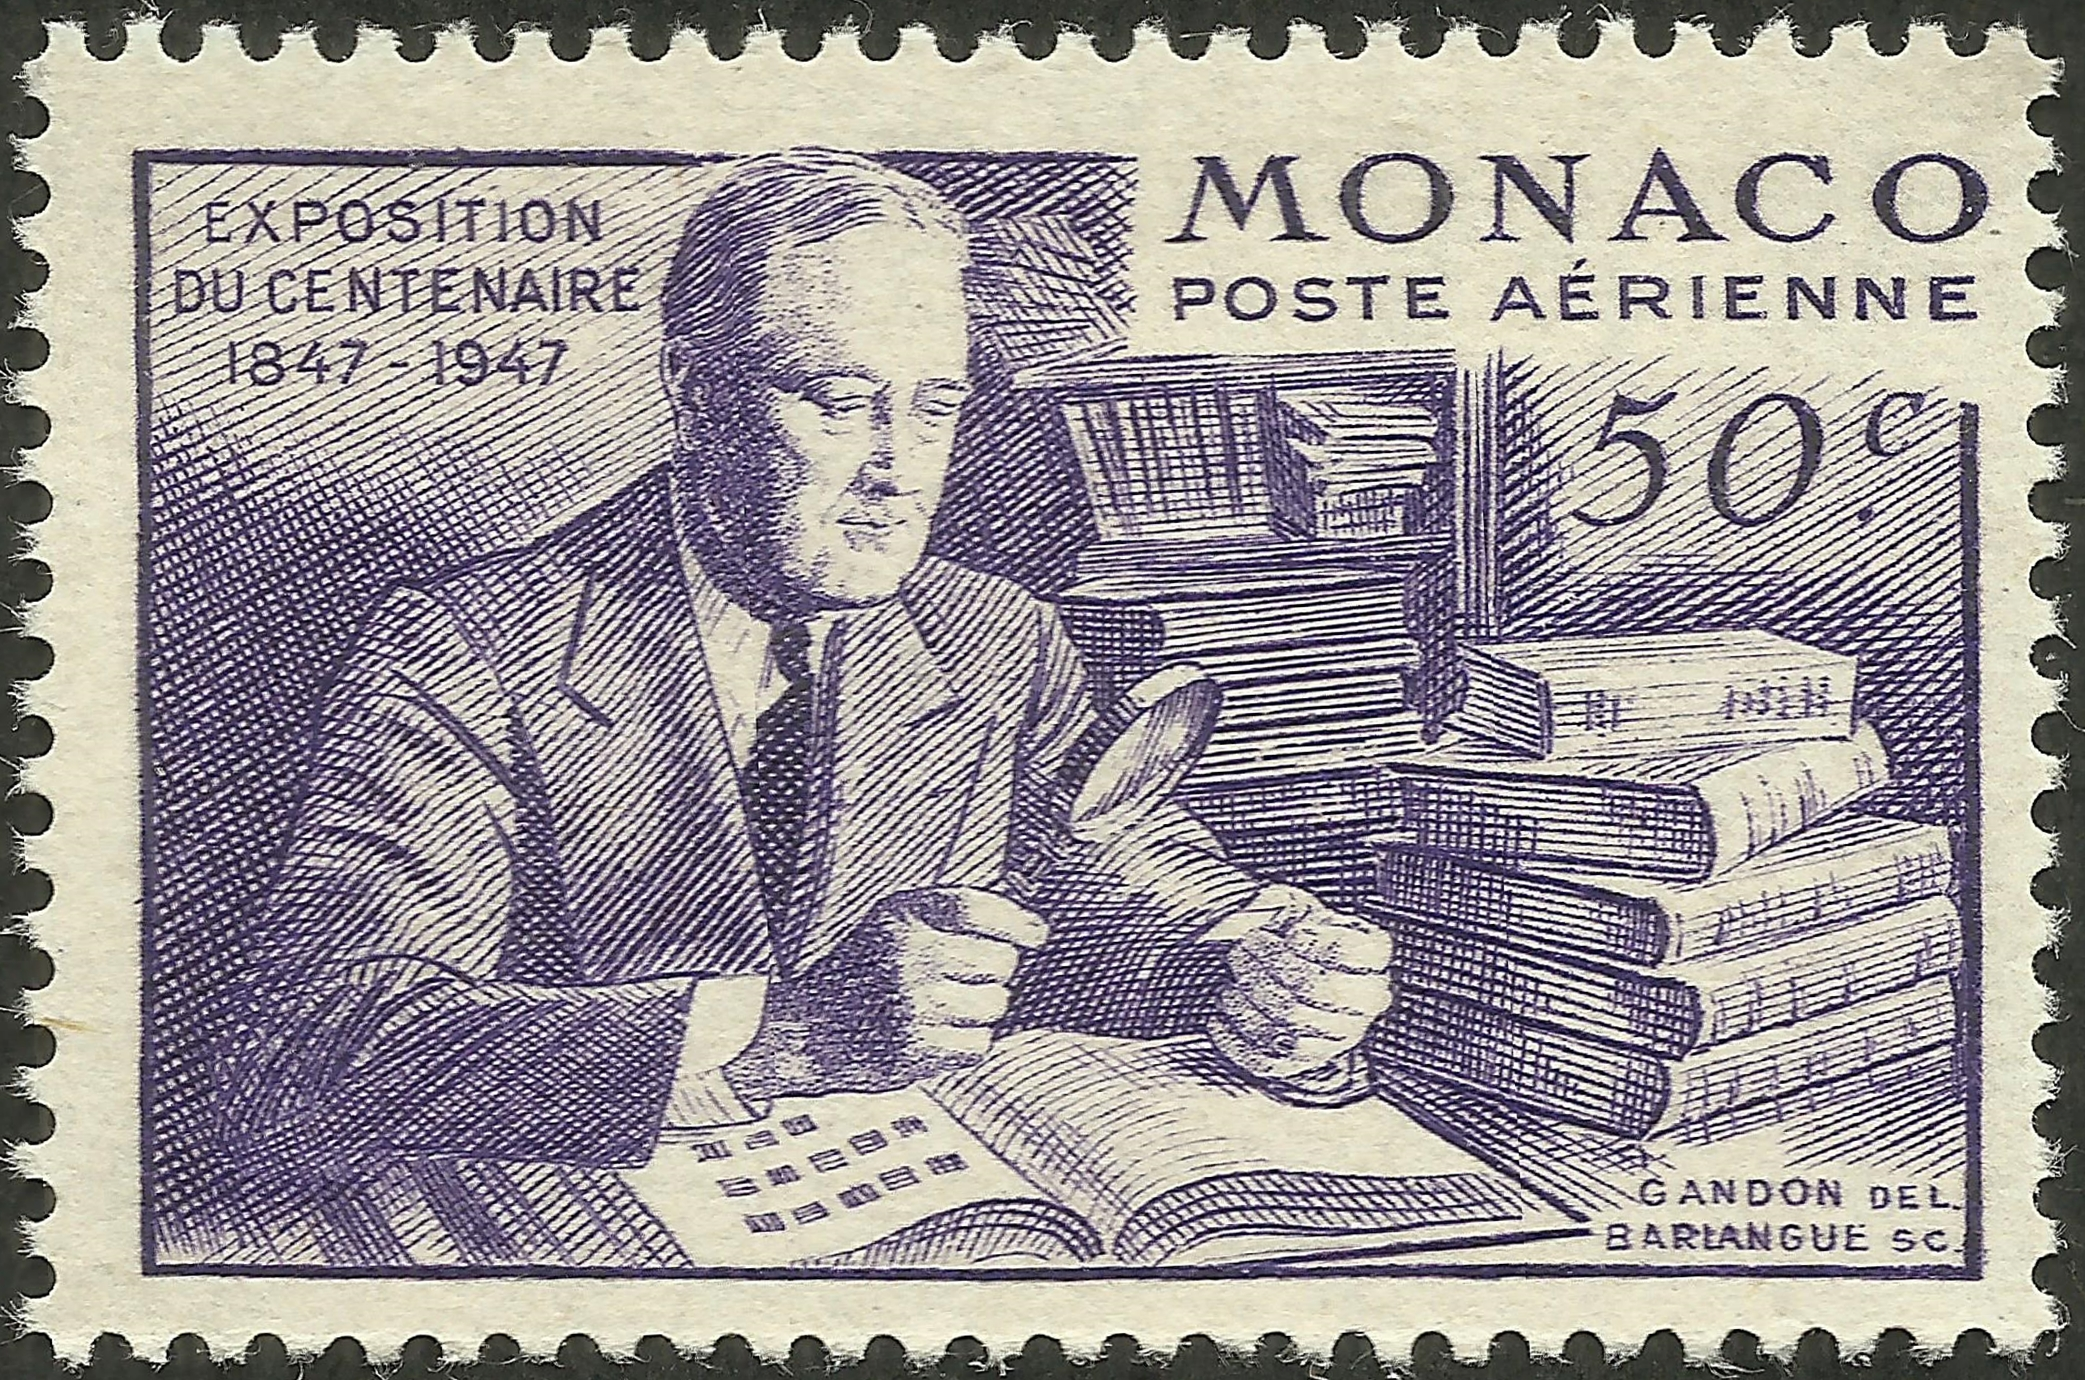 Monaco #C16 (1947)